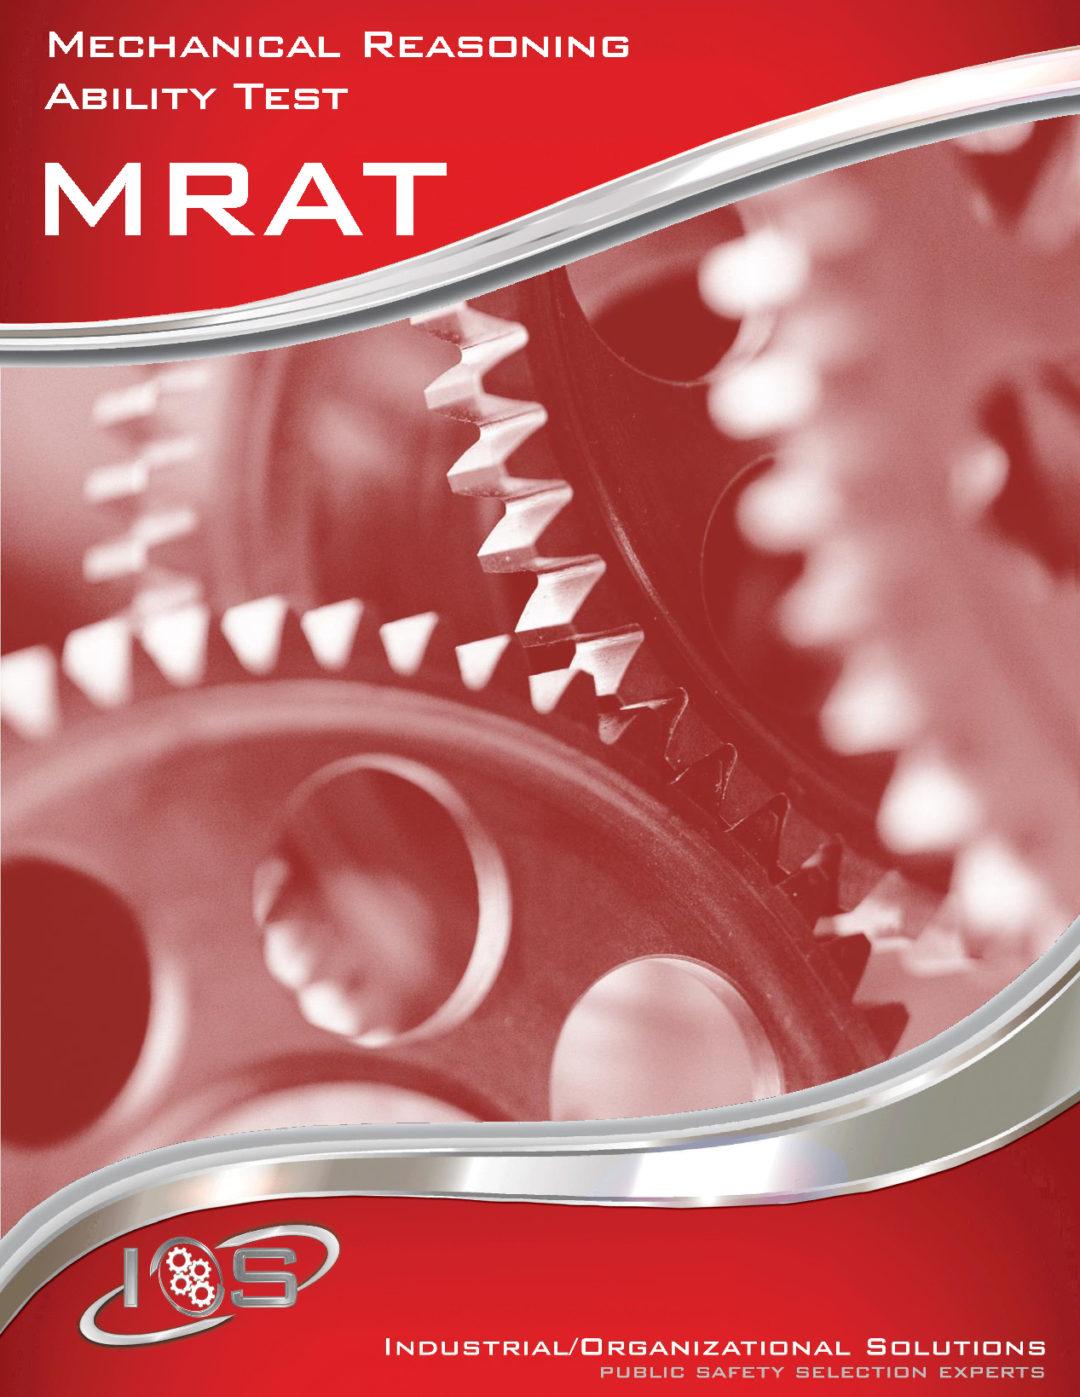 Mechanical Reasoning Ability Test - MRAT